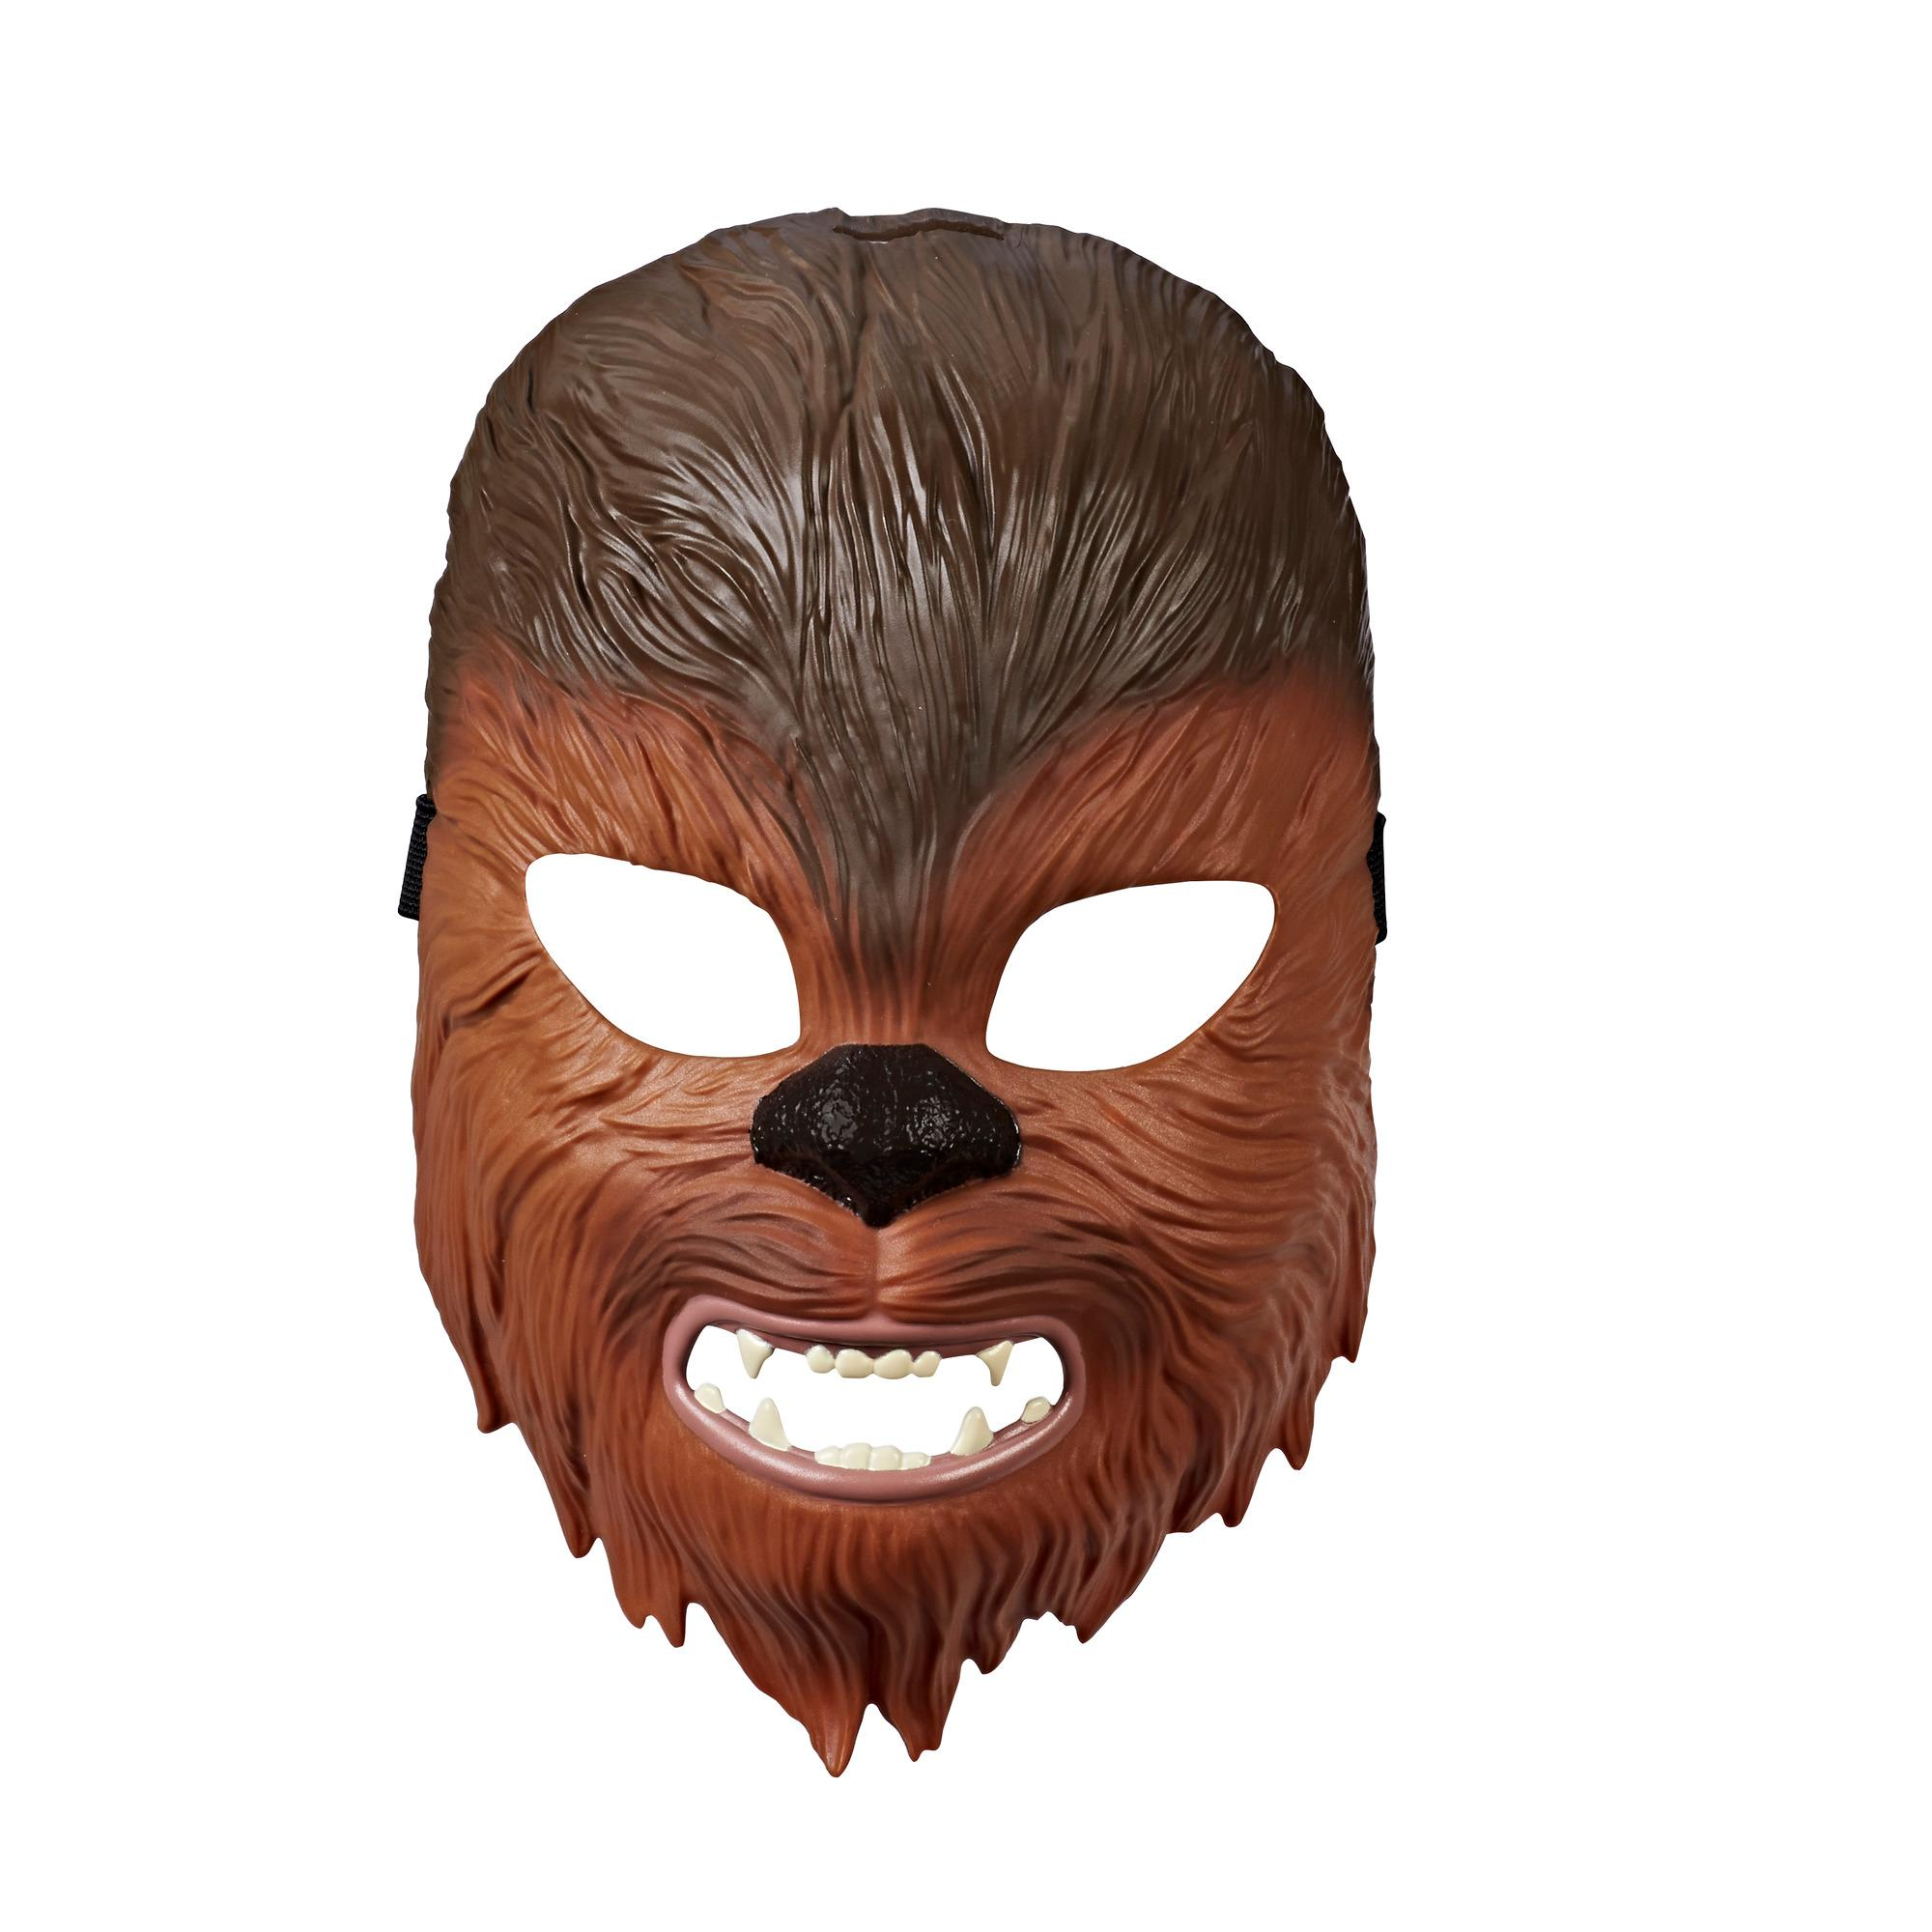 Star Wars Solo: A Star Wars Story Chewbacca Mask